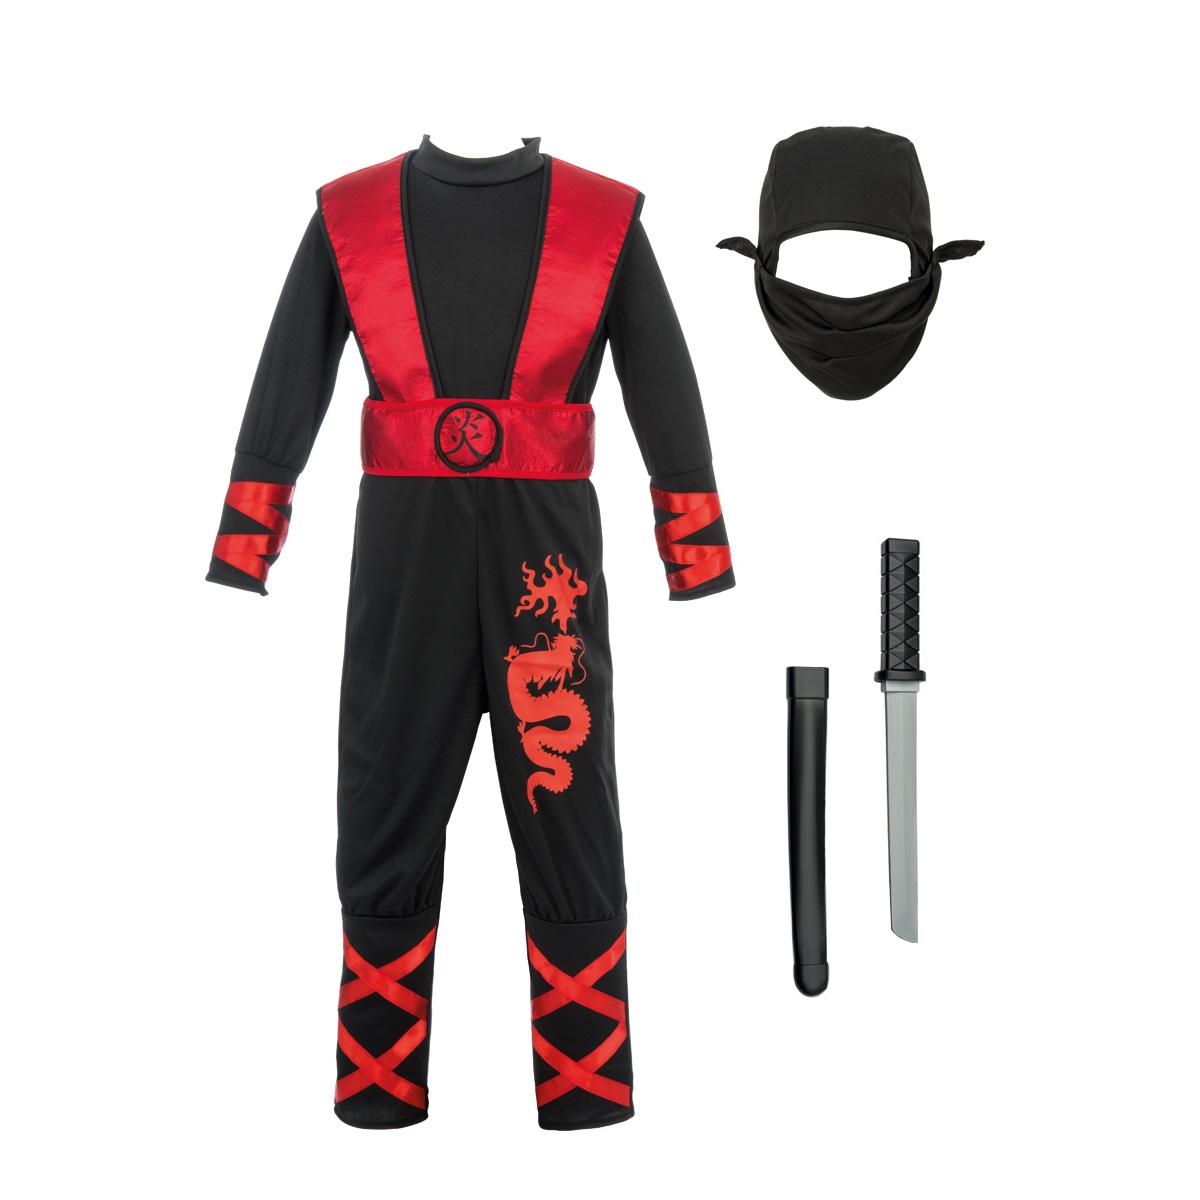 Déguisement de ninja 3-5 ans